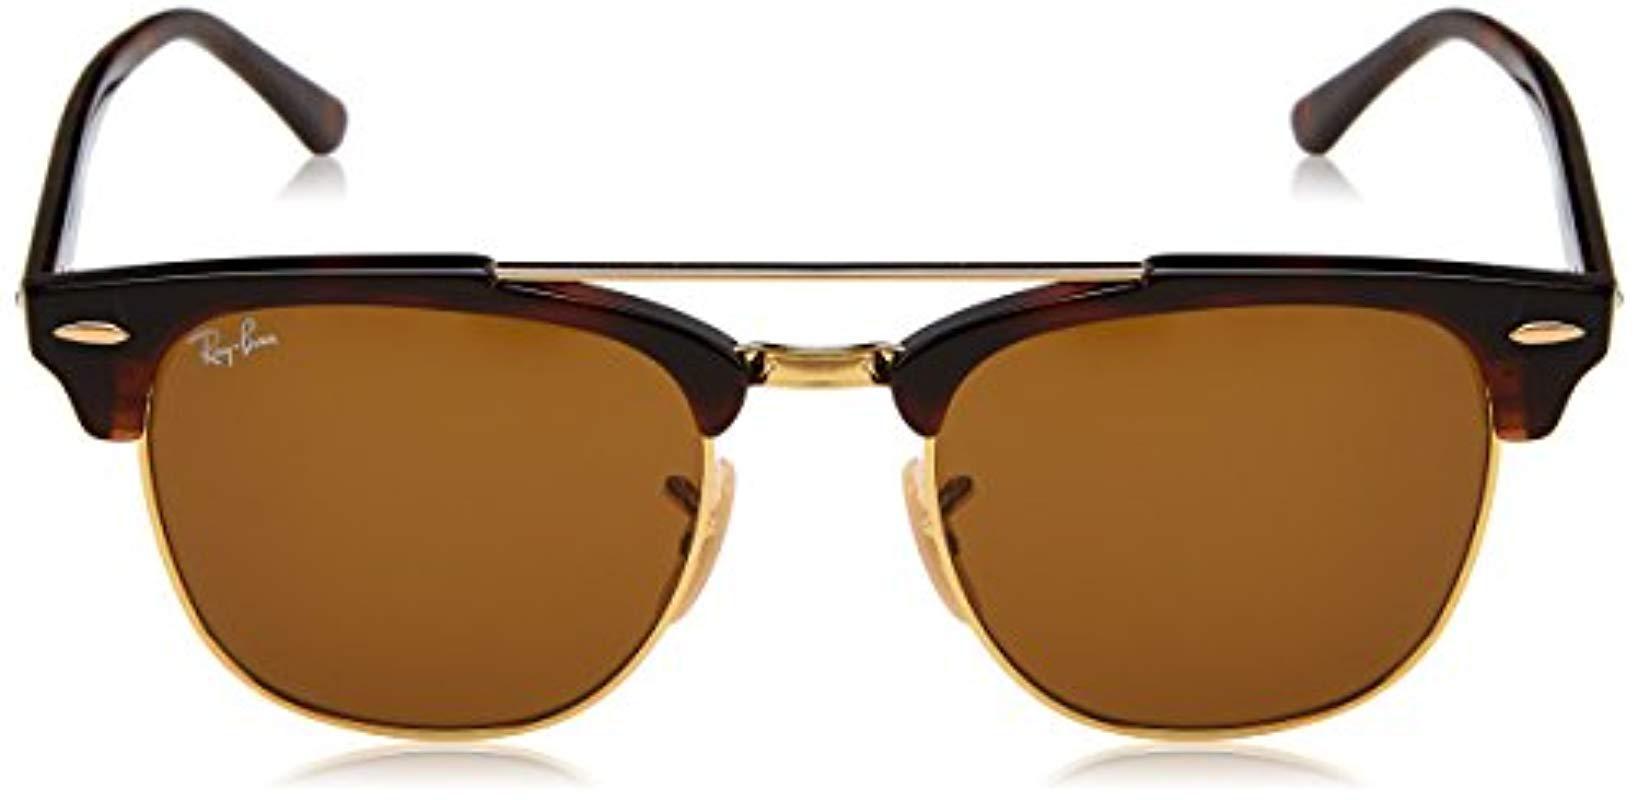 0cccfadc742 Ray-Ban - Clubmaster Double Bridge Sunglasses In Havana Brown Rb3816 990 33  51. View fullscreen